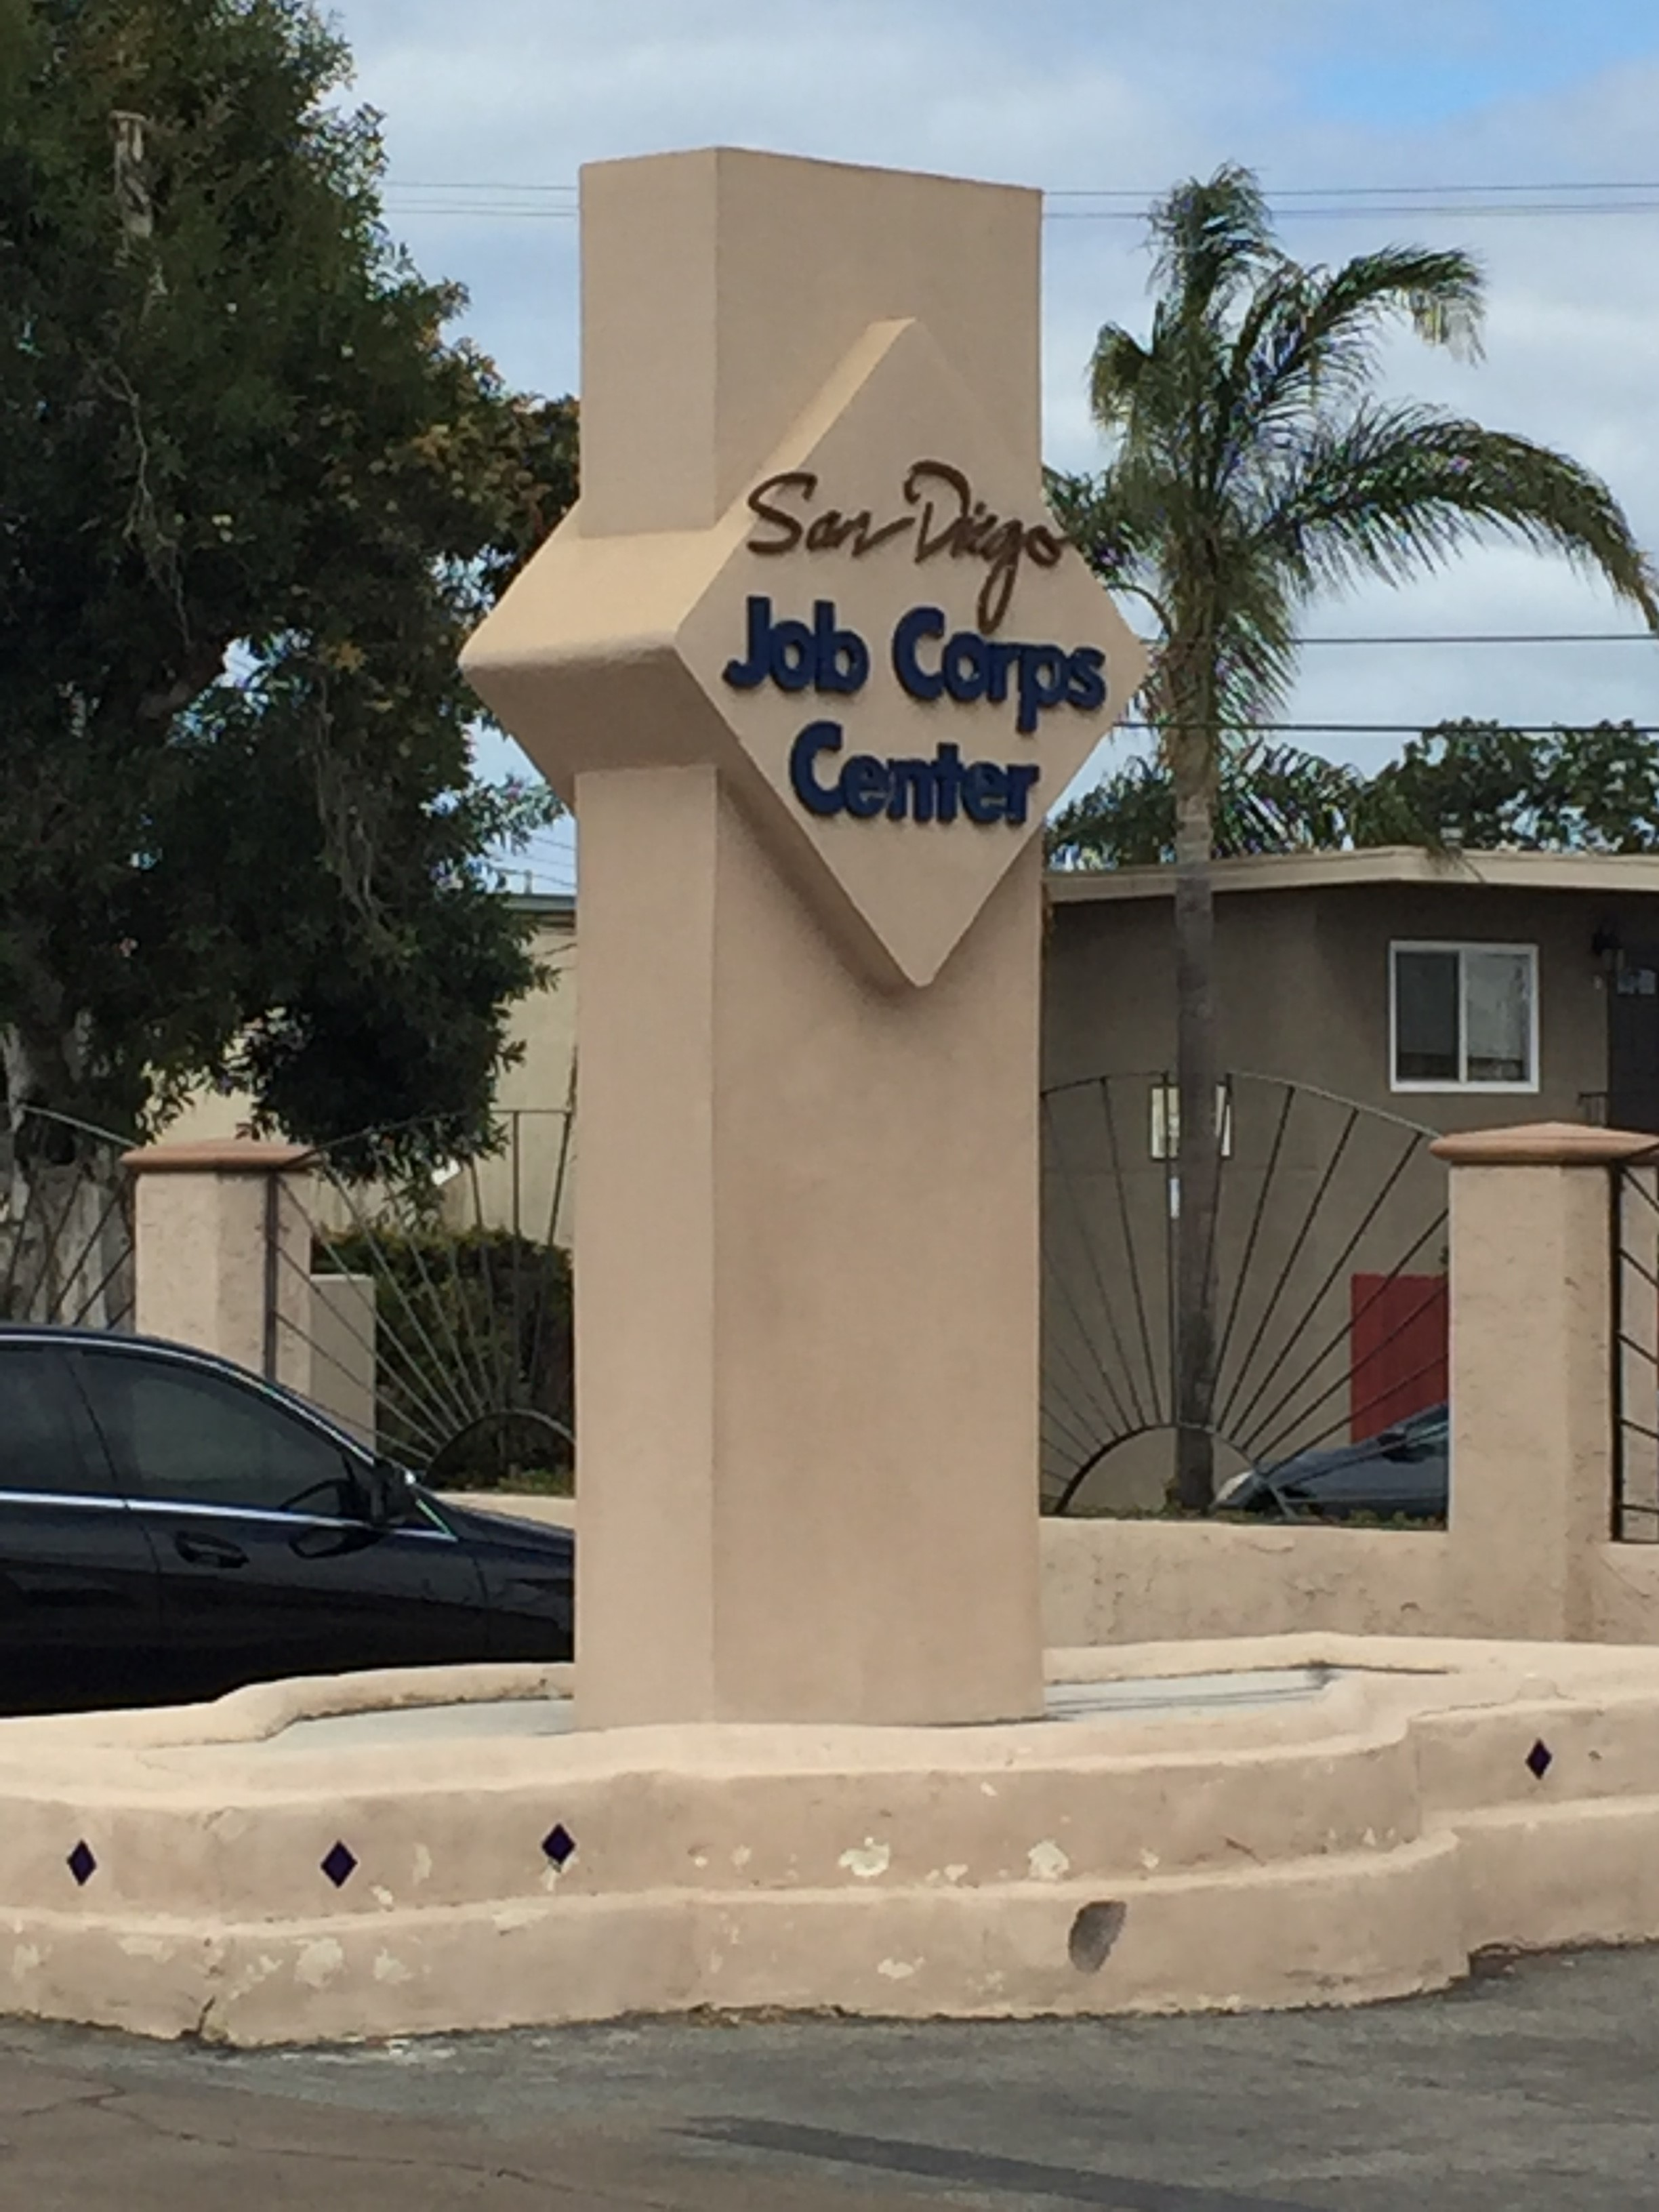 NICB facilitates cement mixer donation to San Diego Job